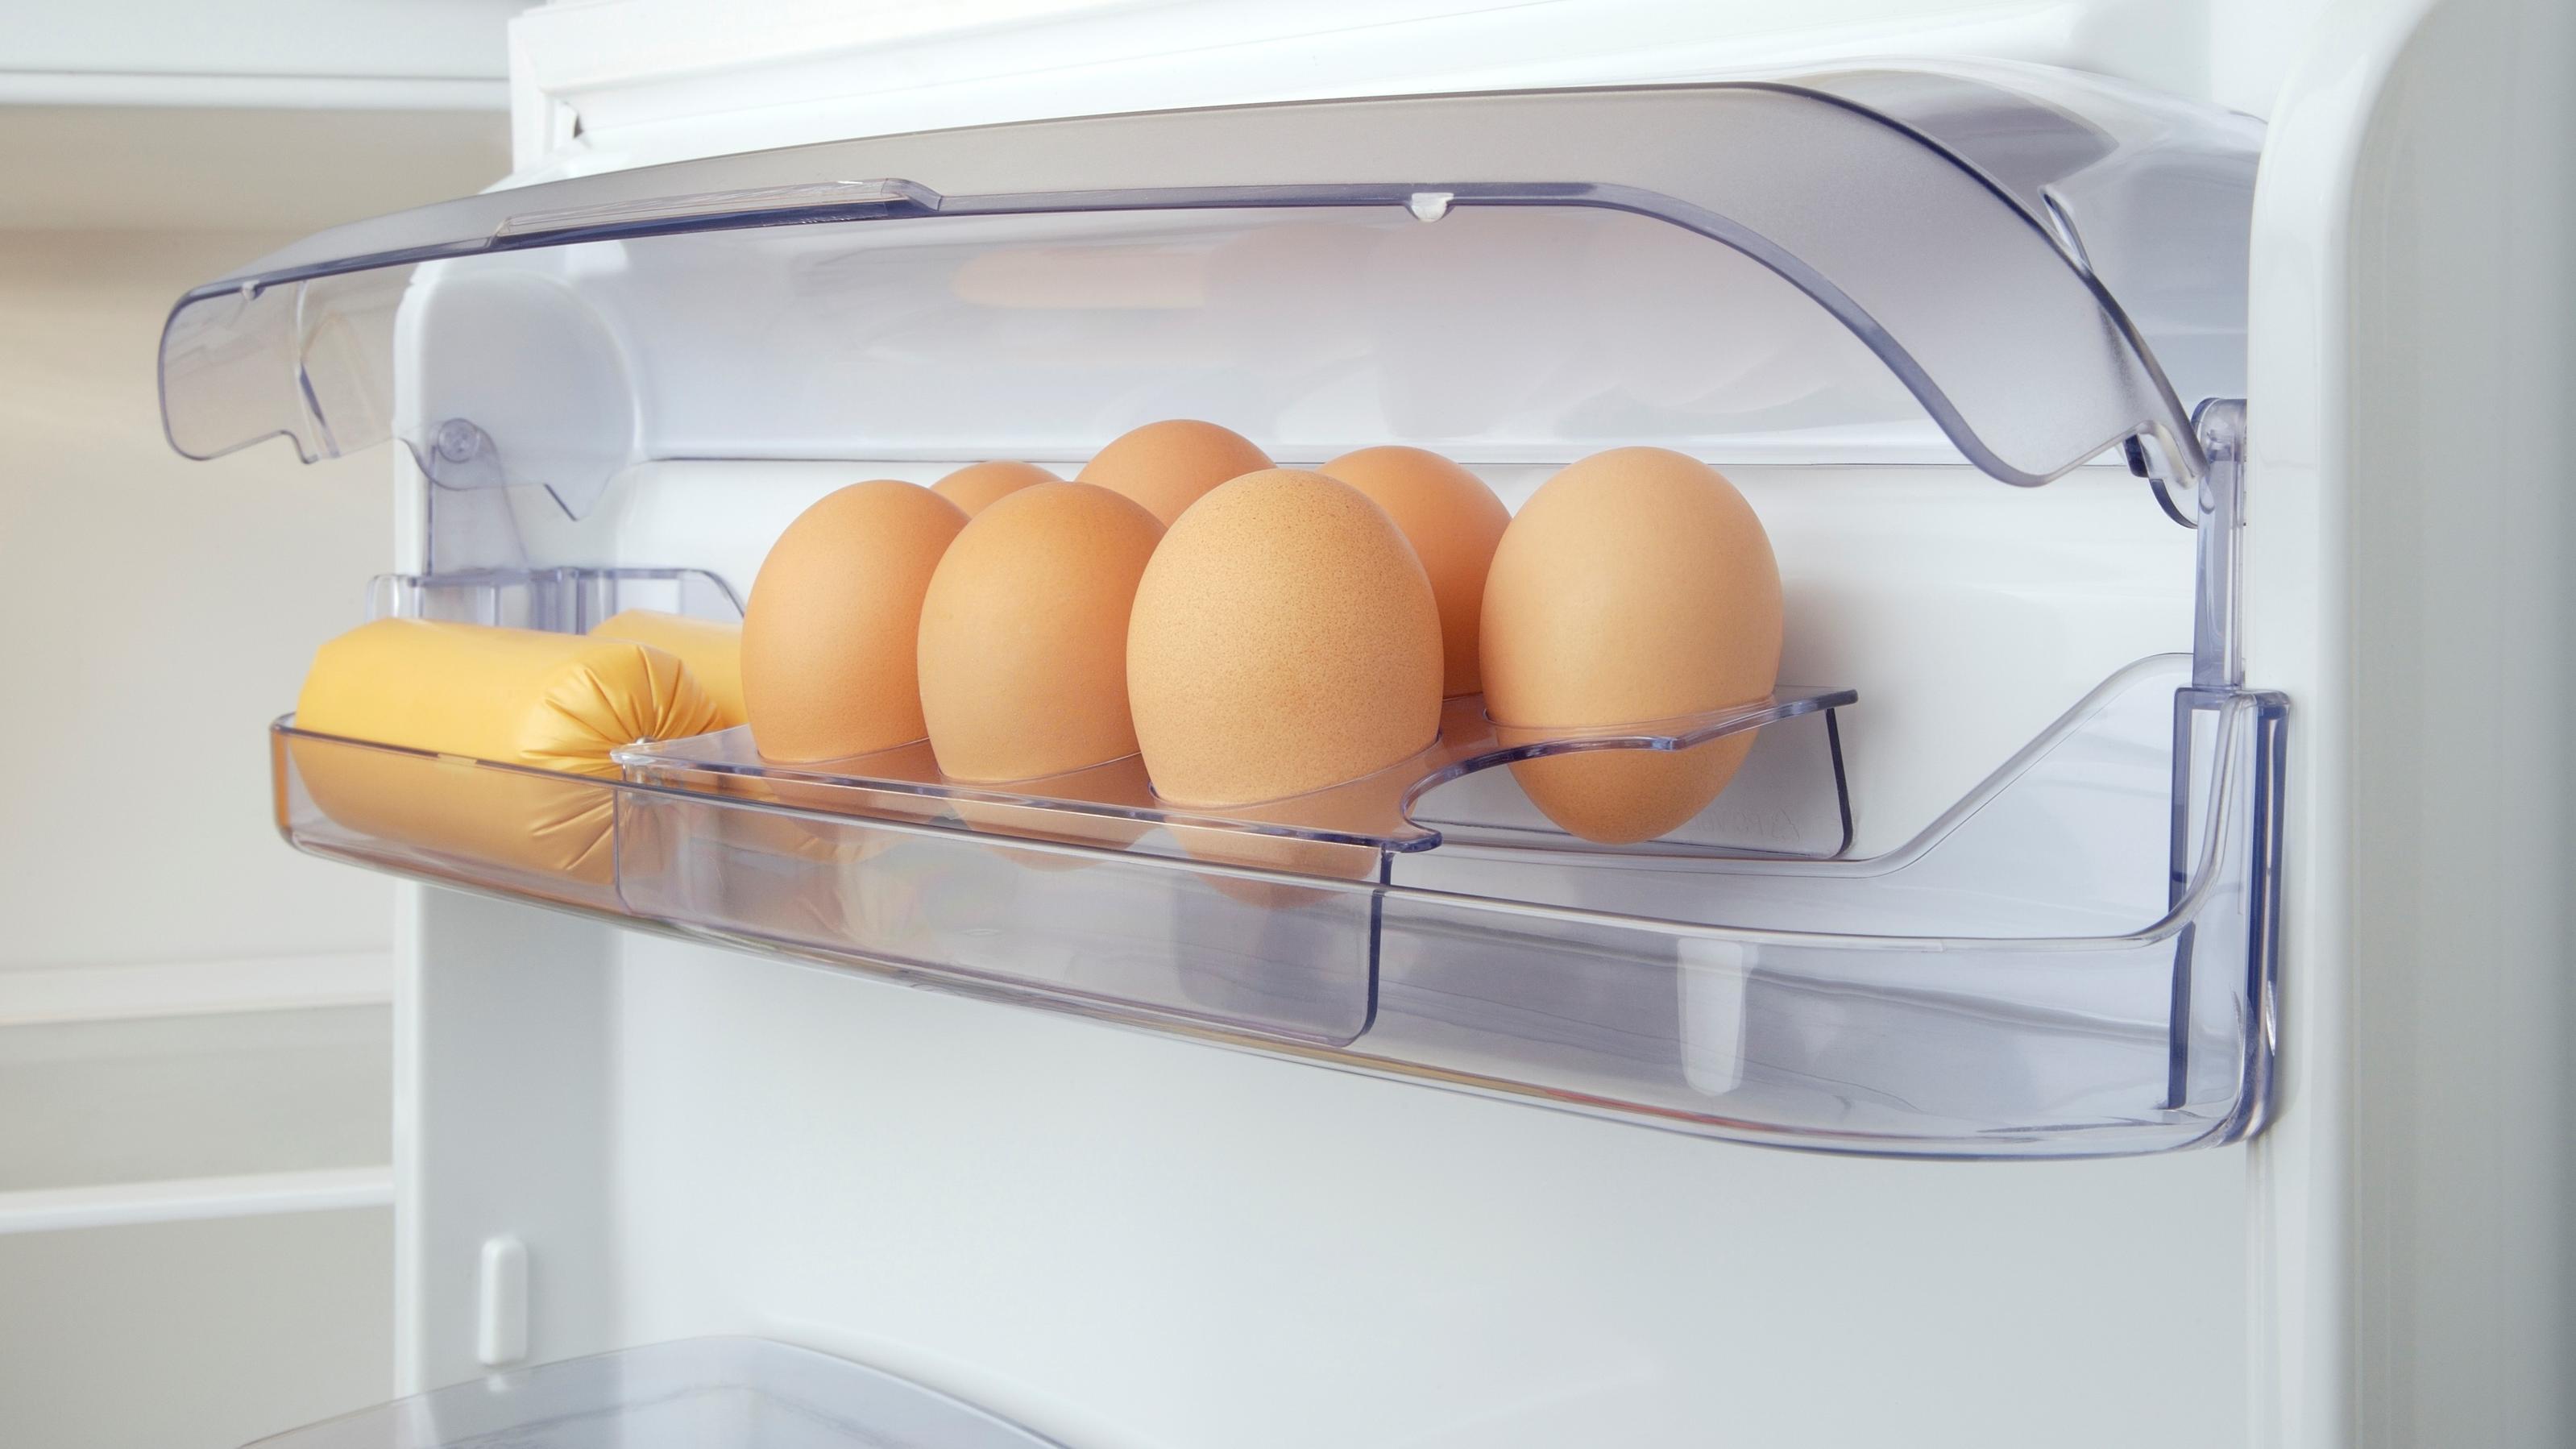 rohe eier l nger haltbar machen so funktioniert 39 s. Black Bedroom Furniture Sets. Home Design Ideas